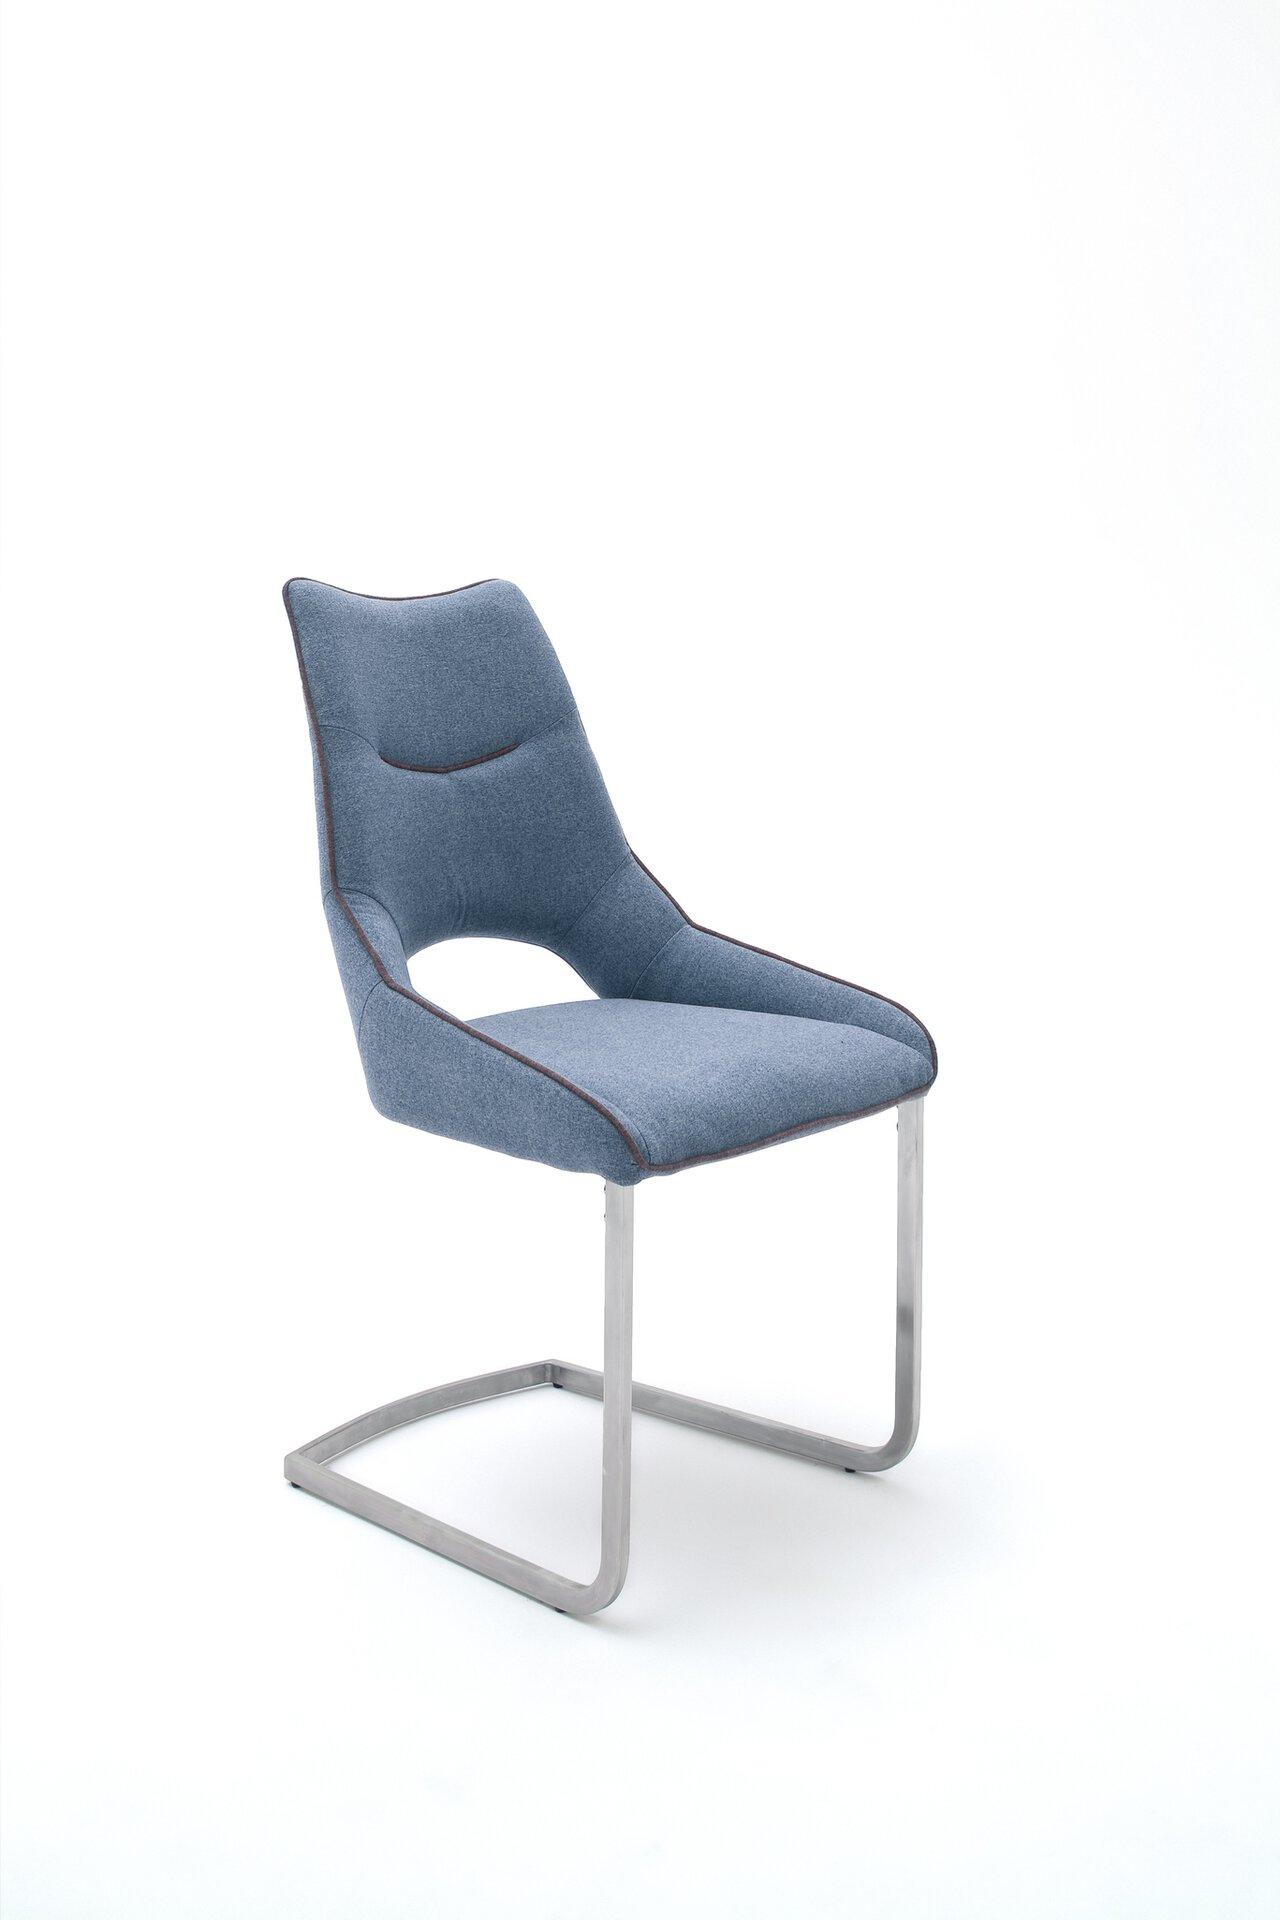 Stuhl ALDRINA MCA furniture Textil mehrfarbig 62 x 96 x 53 cm